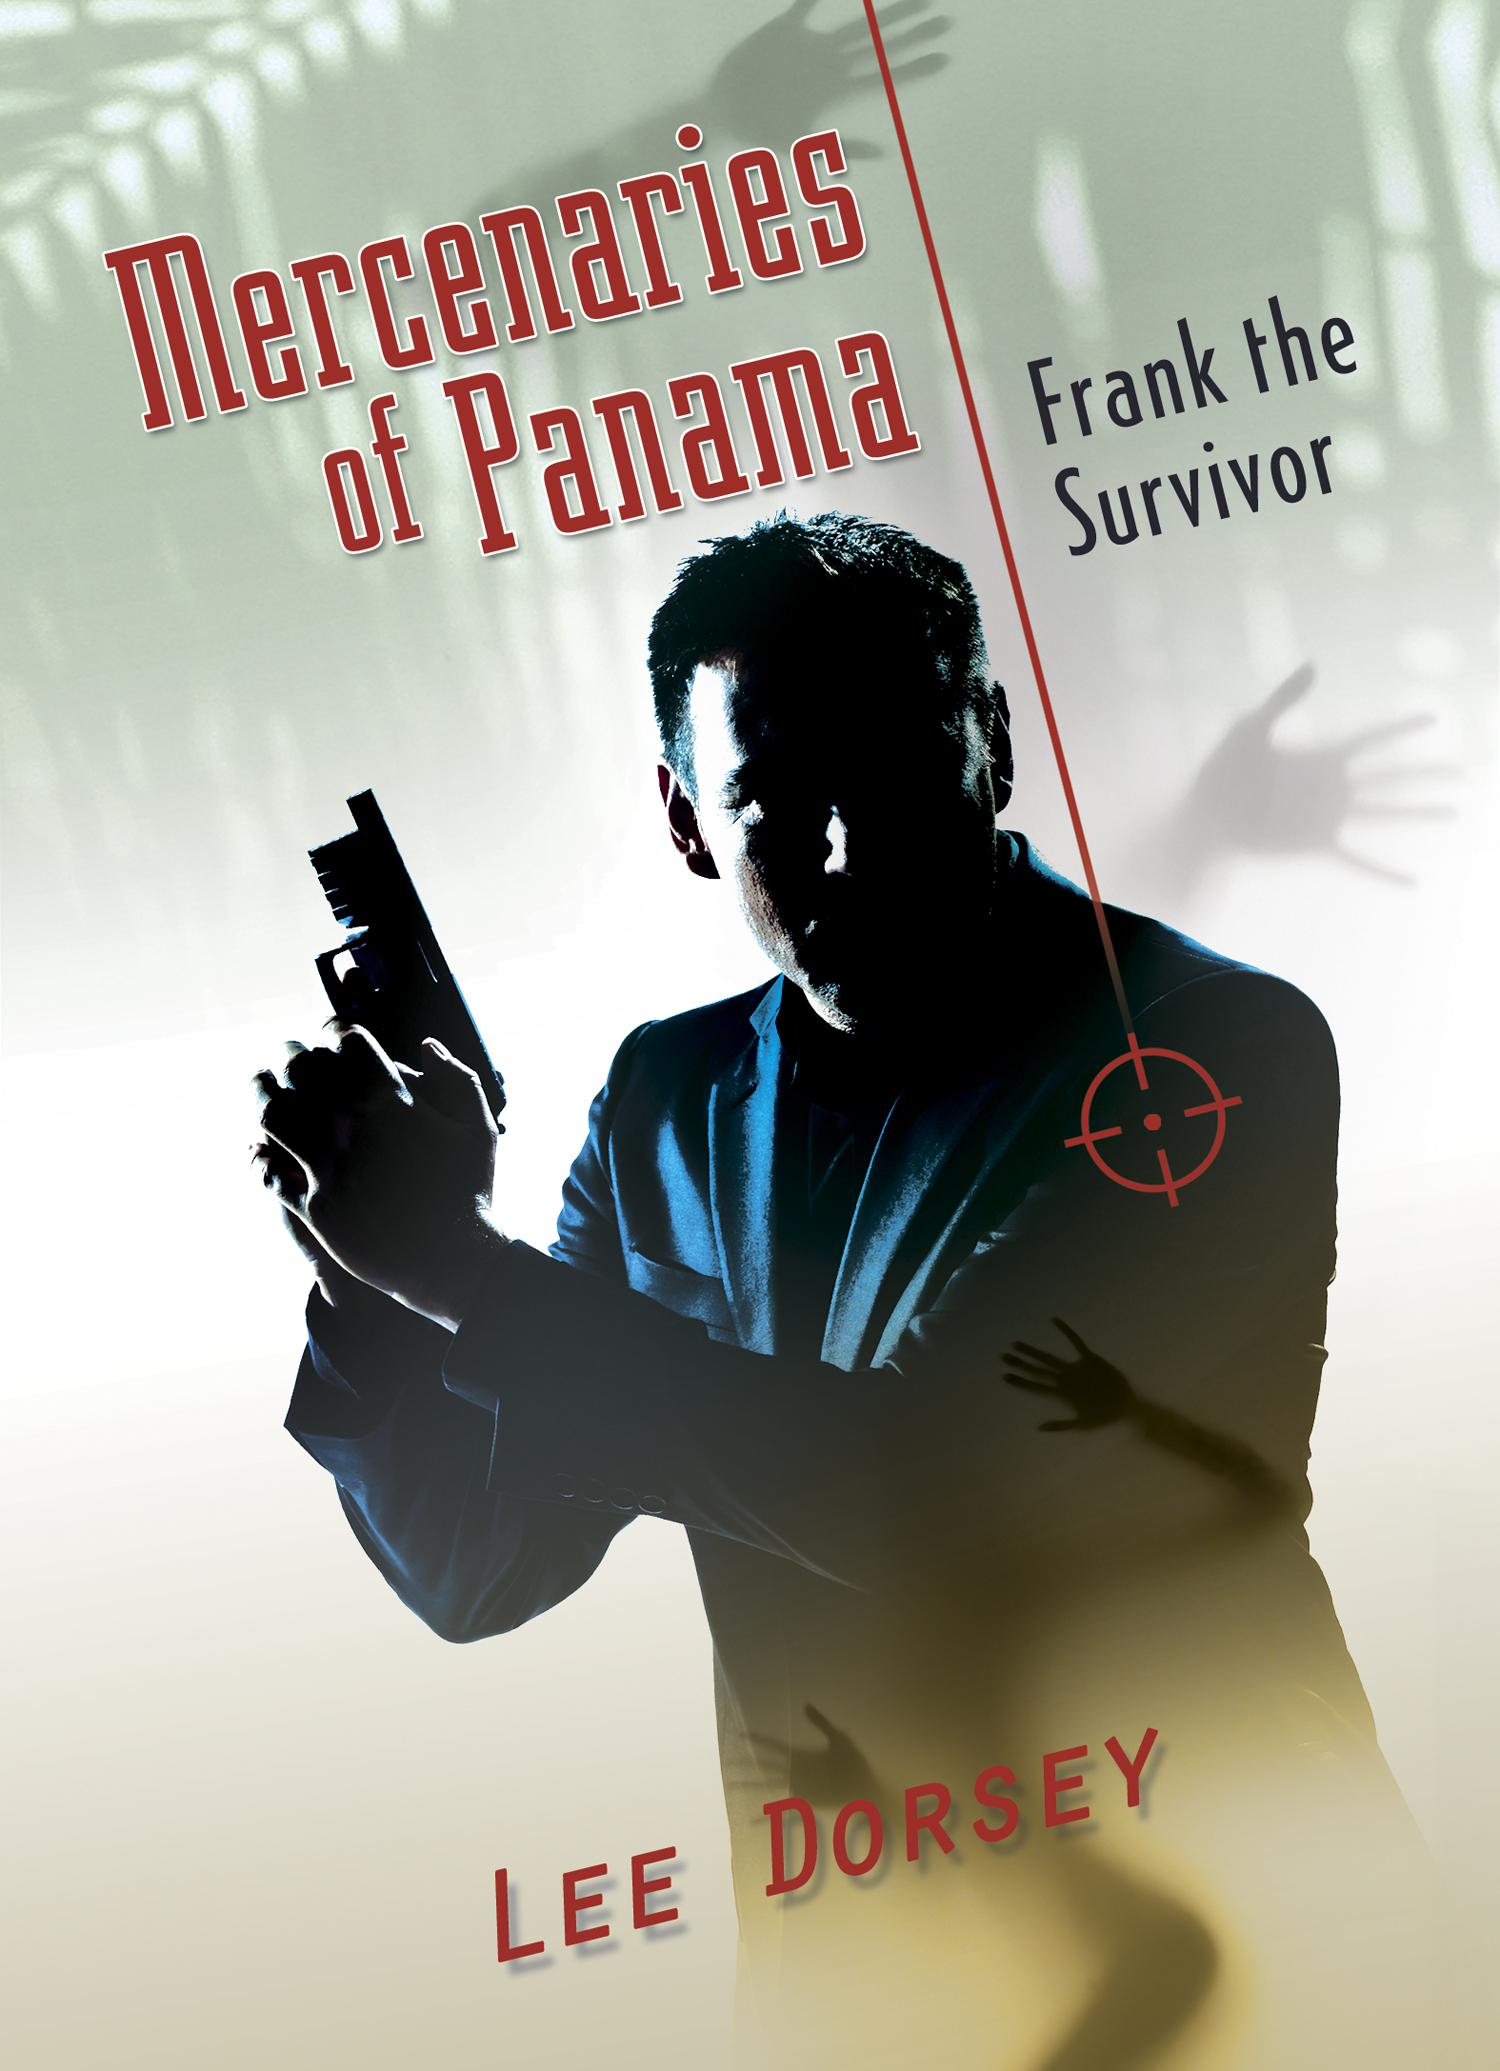 Mercenaries of Panama—Frank the Survivor